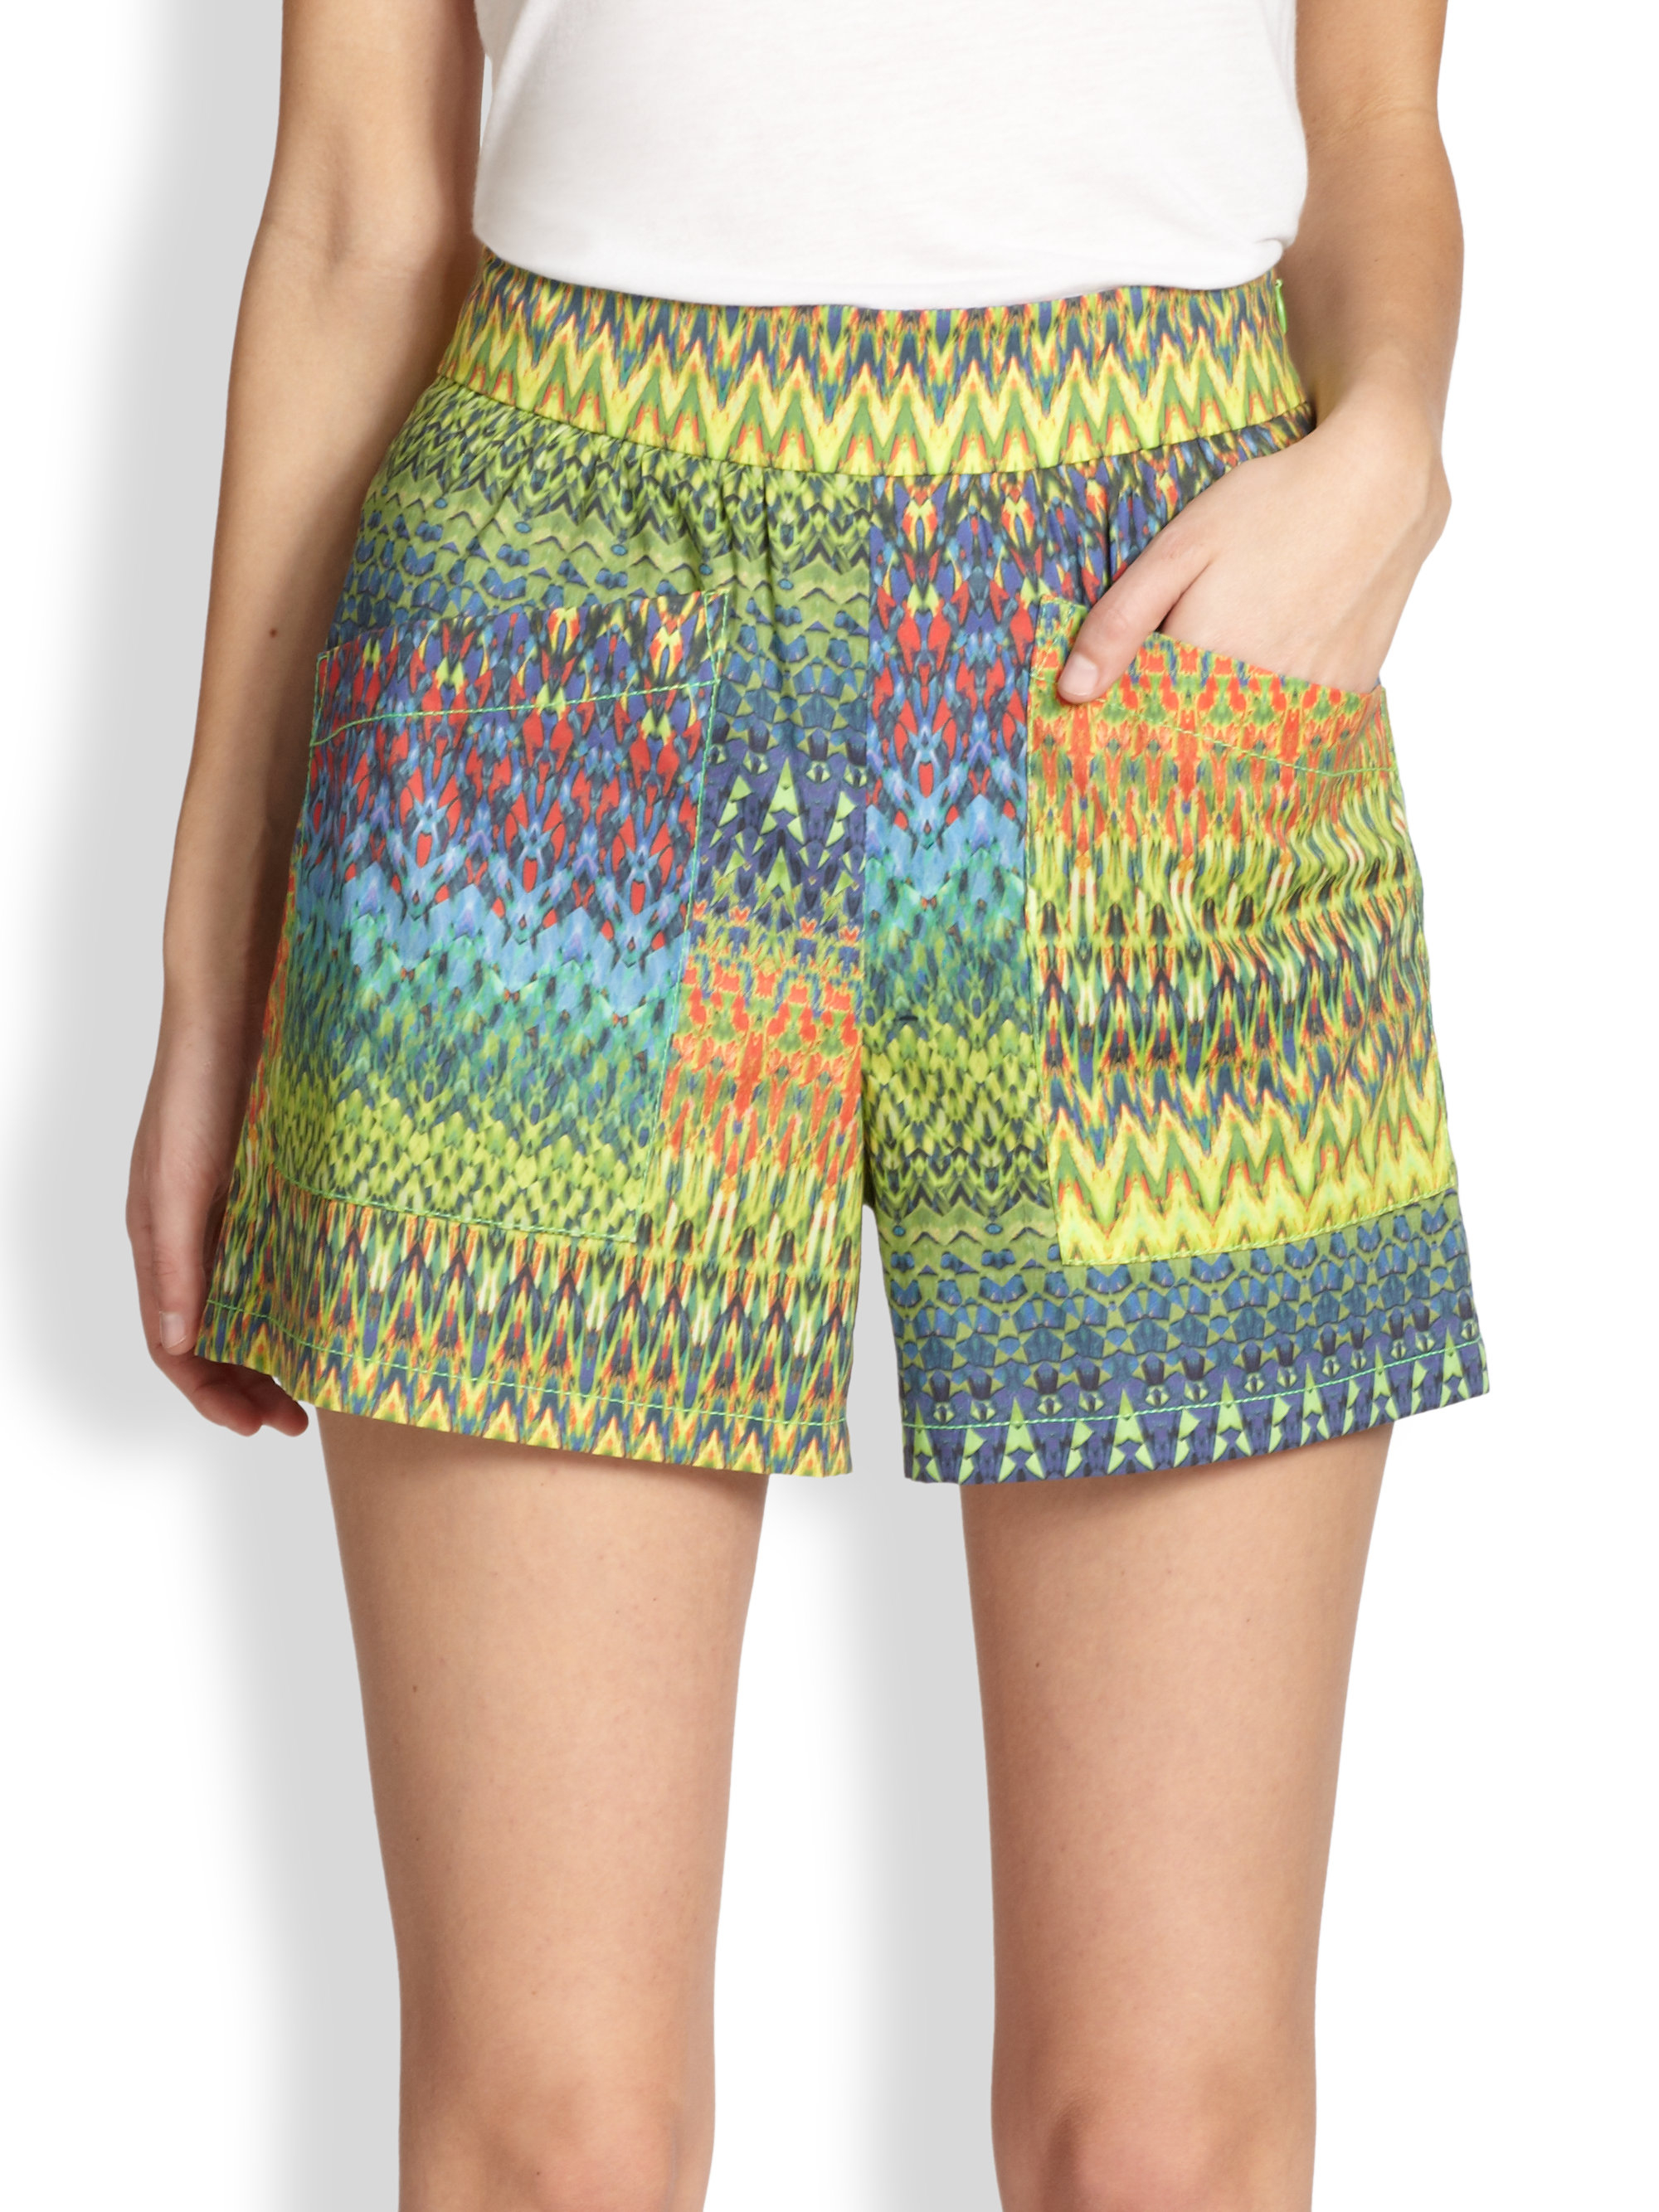 fantasy knit shorts - Black M Missoni Fake Sale Online Visit For Sale Amazing Price Online 4i8oC